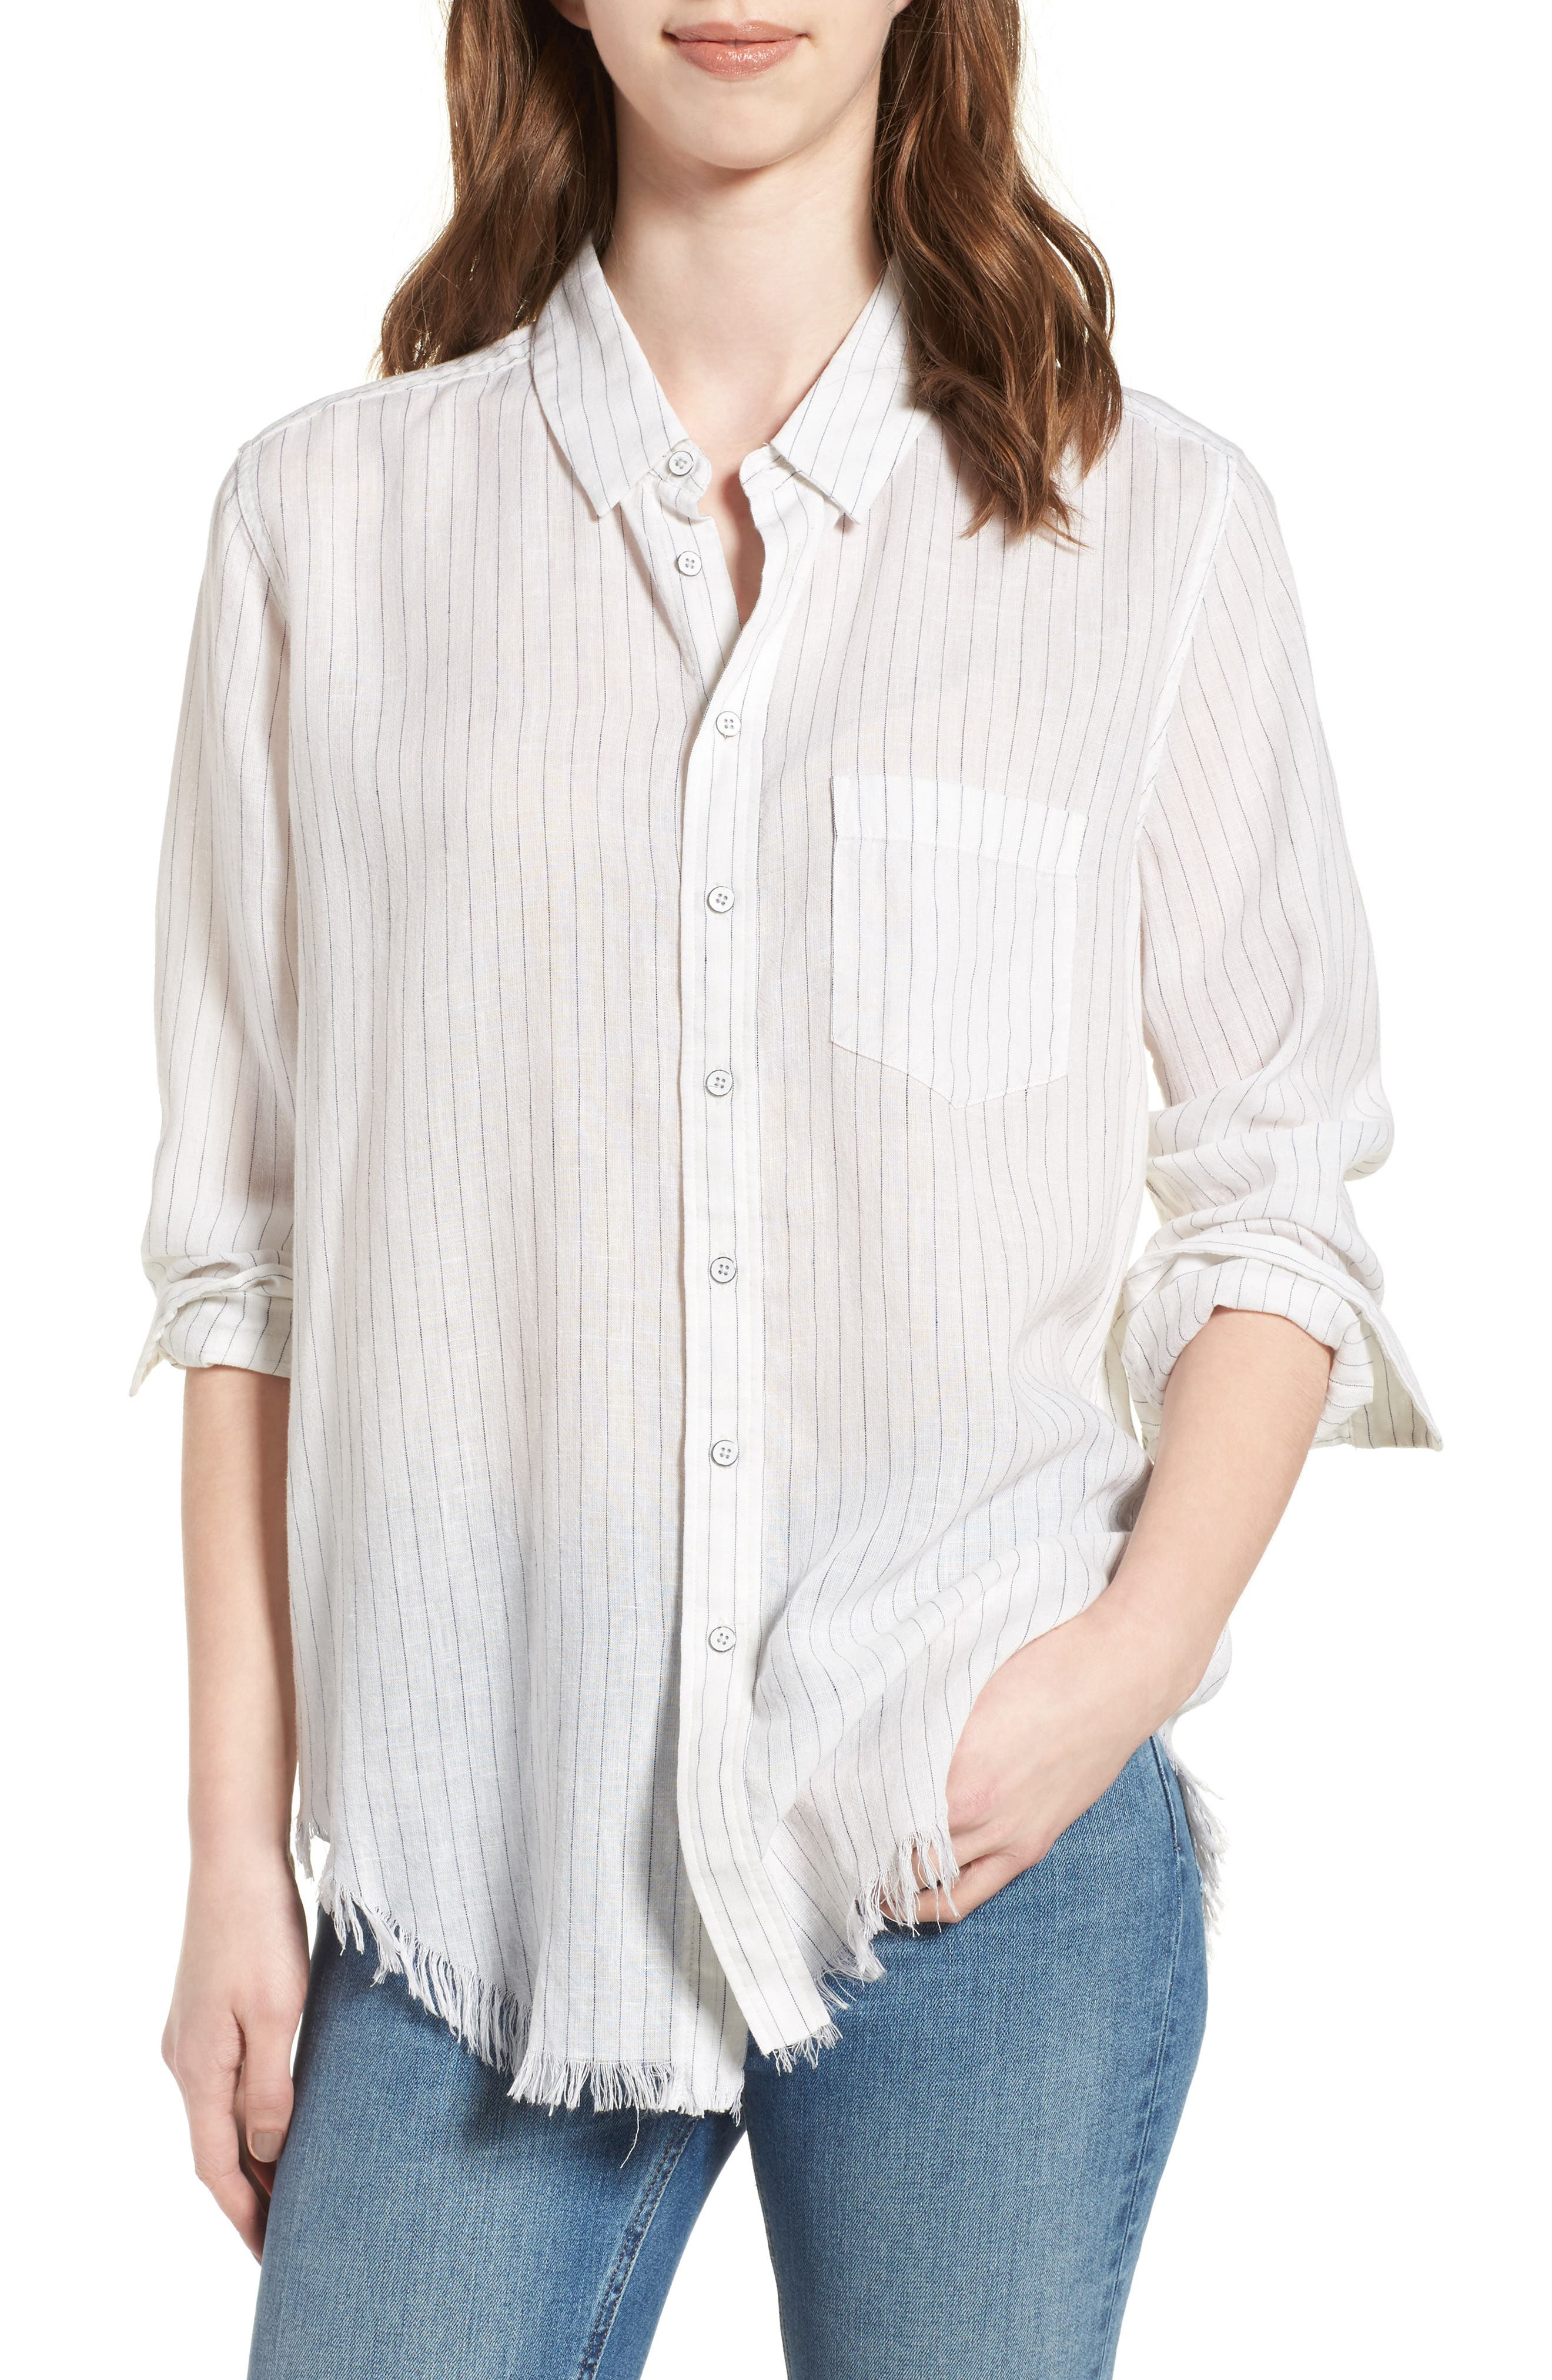 Nassau & Manhattan Boyfriend Shirt,                         Main,                         color, Blue/ Cream